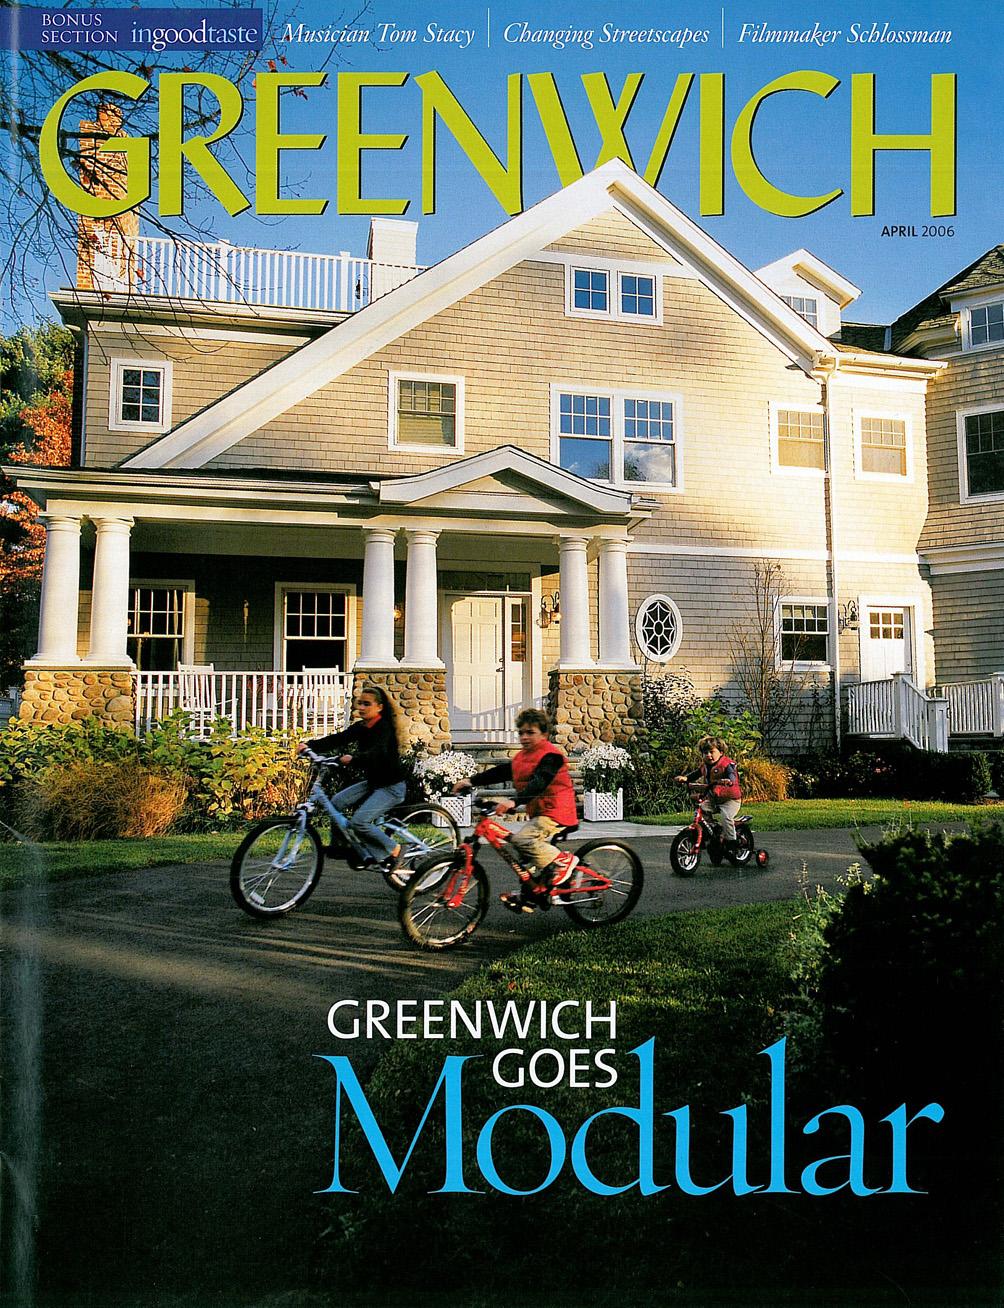 Greenwich Magazine, April 2006